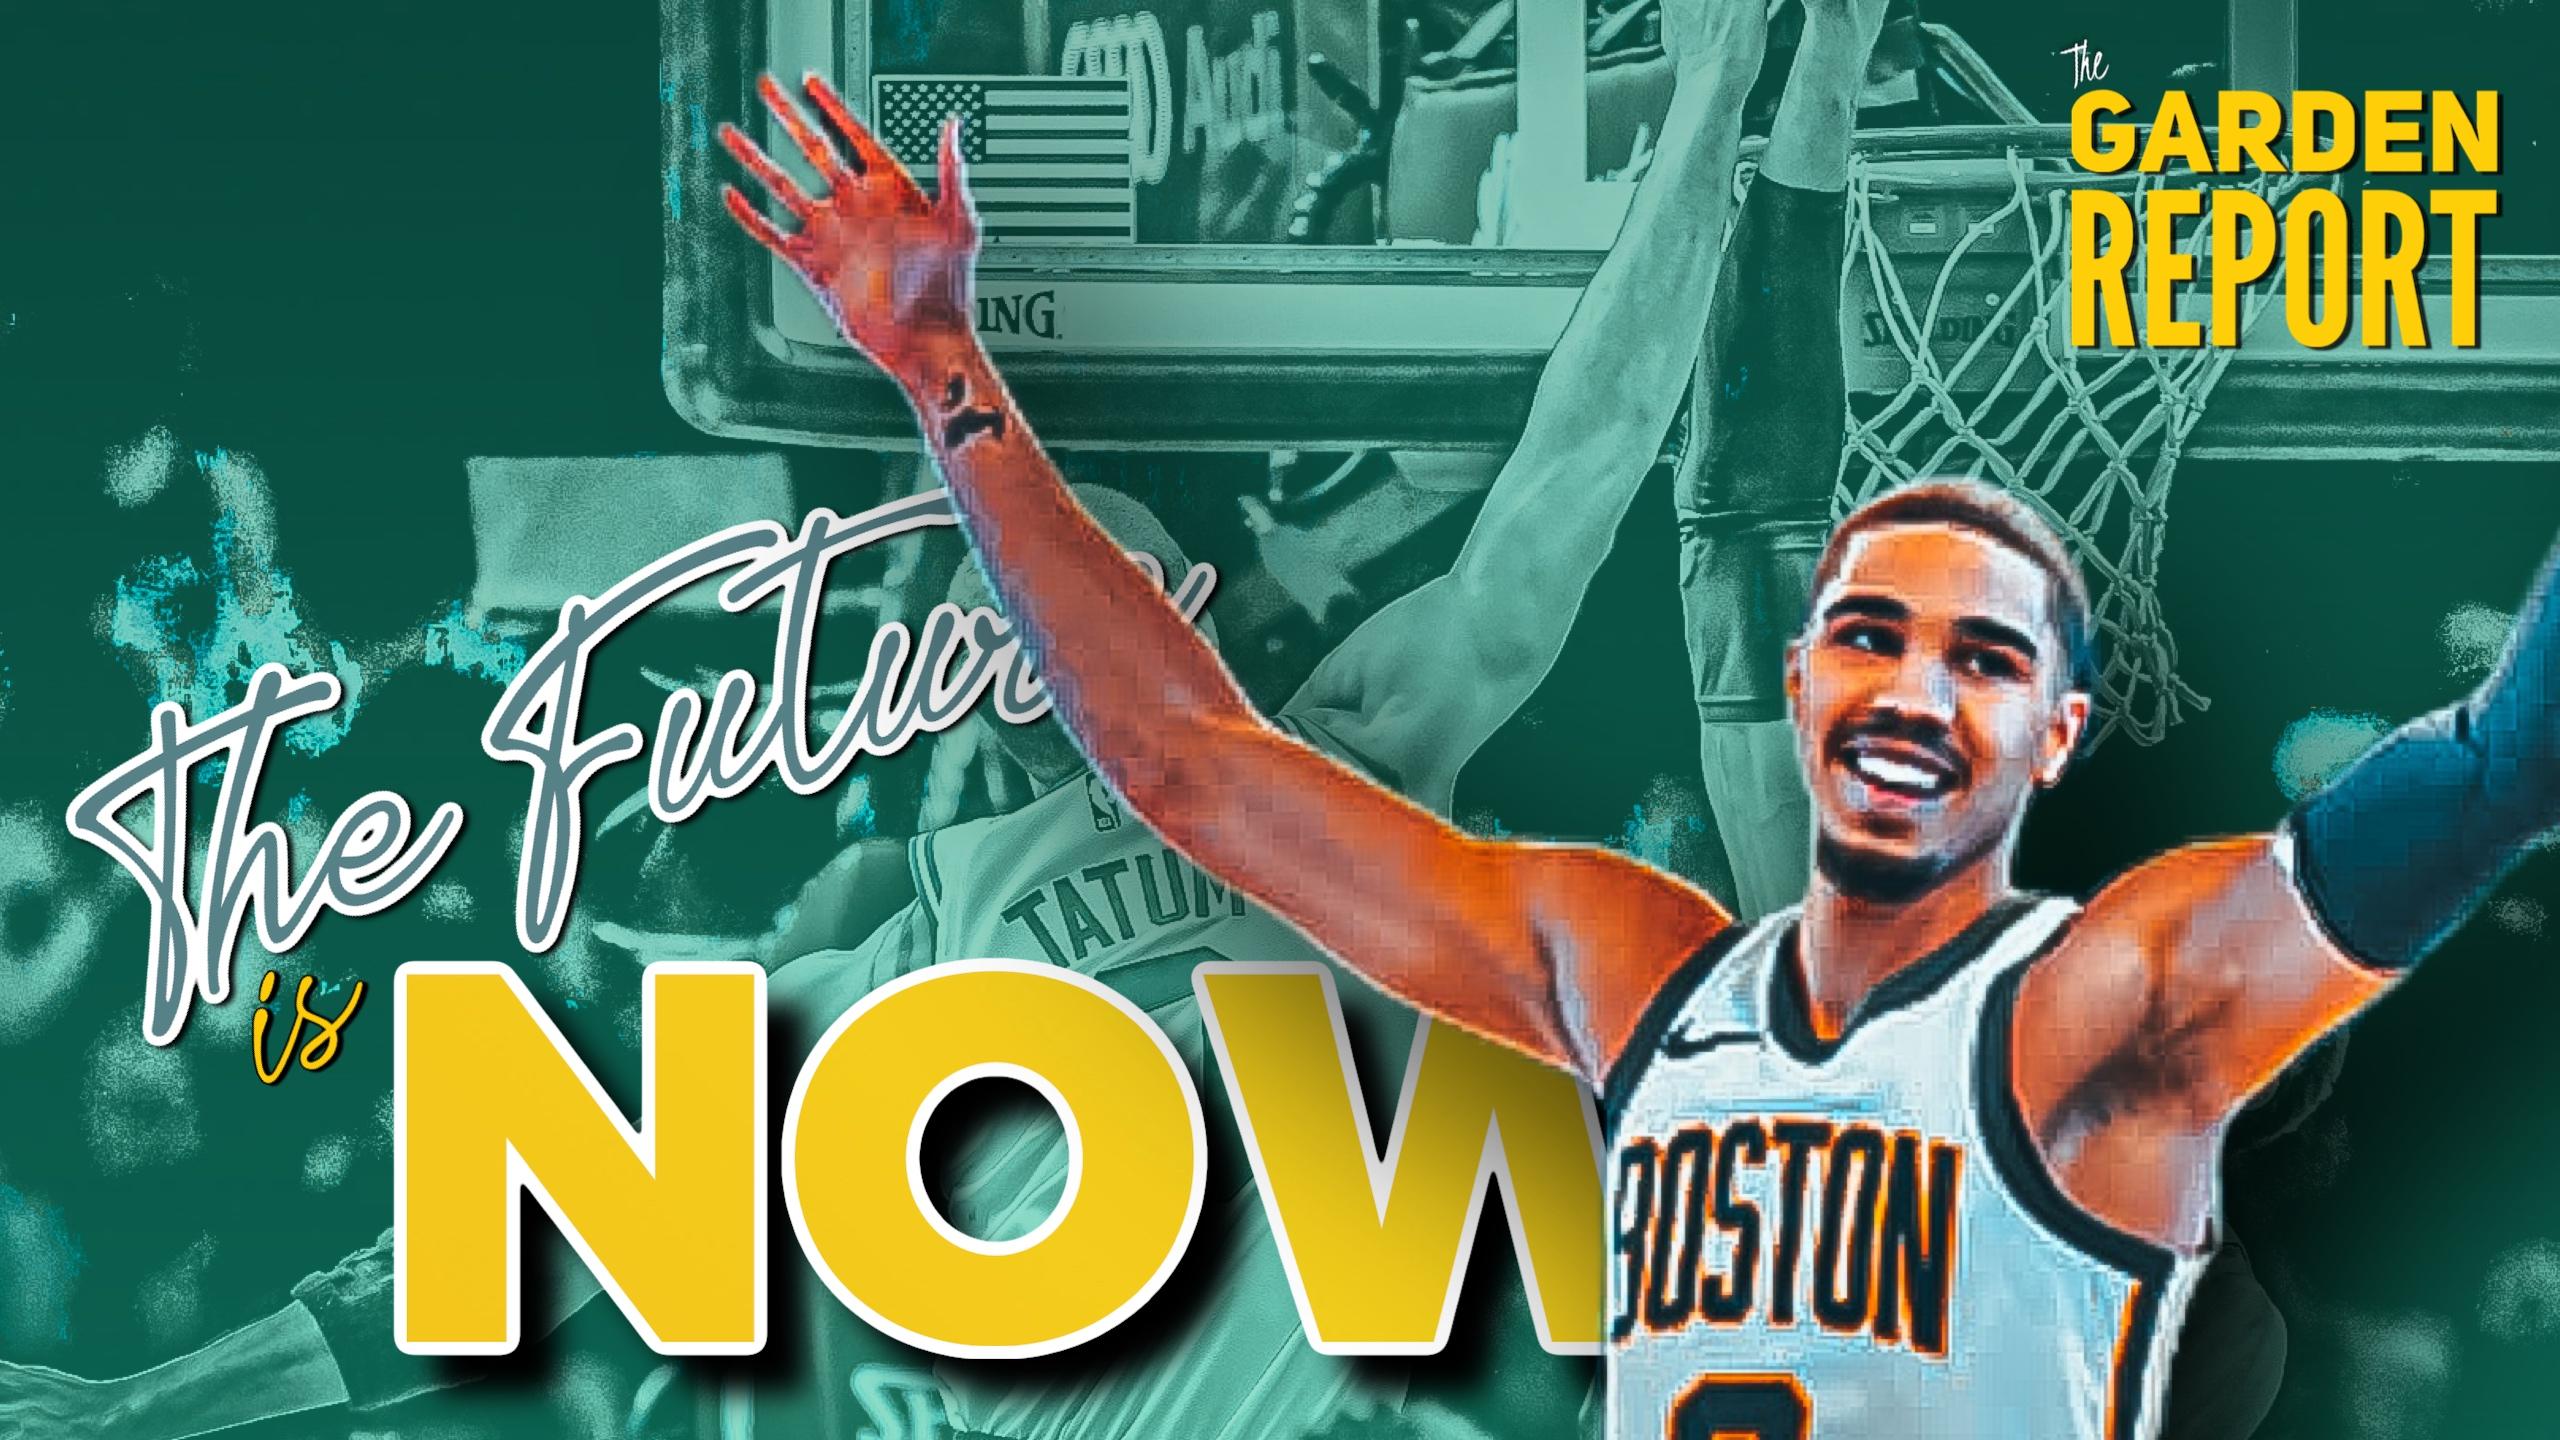 NBA FREE AGENCY: Jayson Tatum EXTENSION; No Go on Bogdan; Tristan Thompson Signs